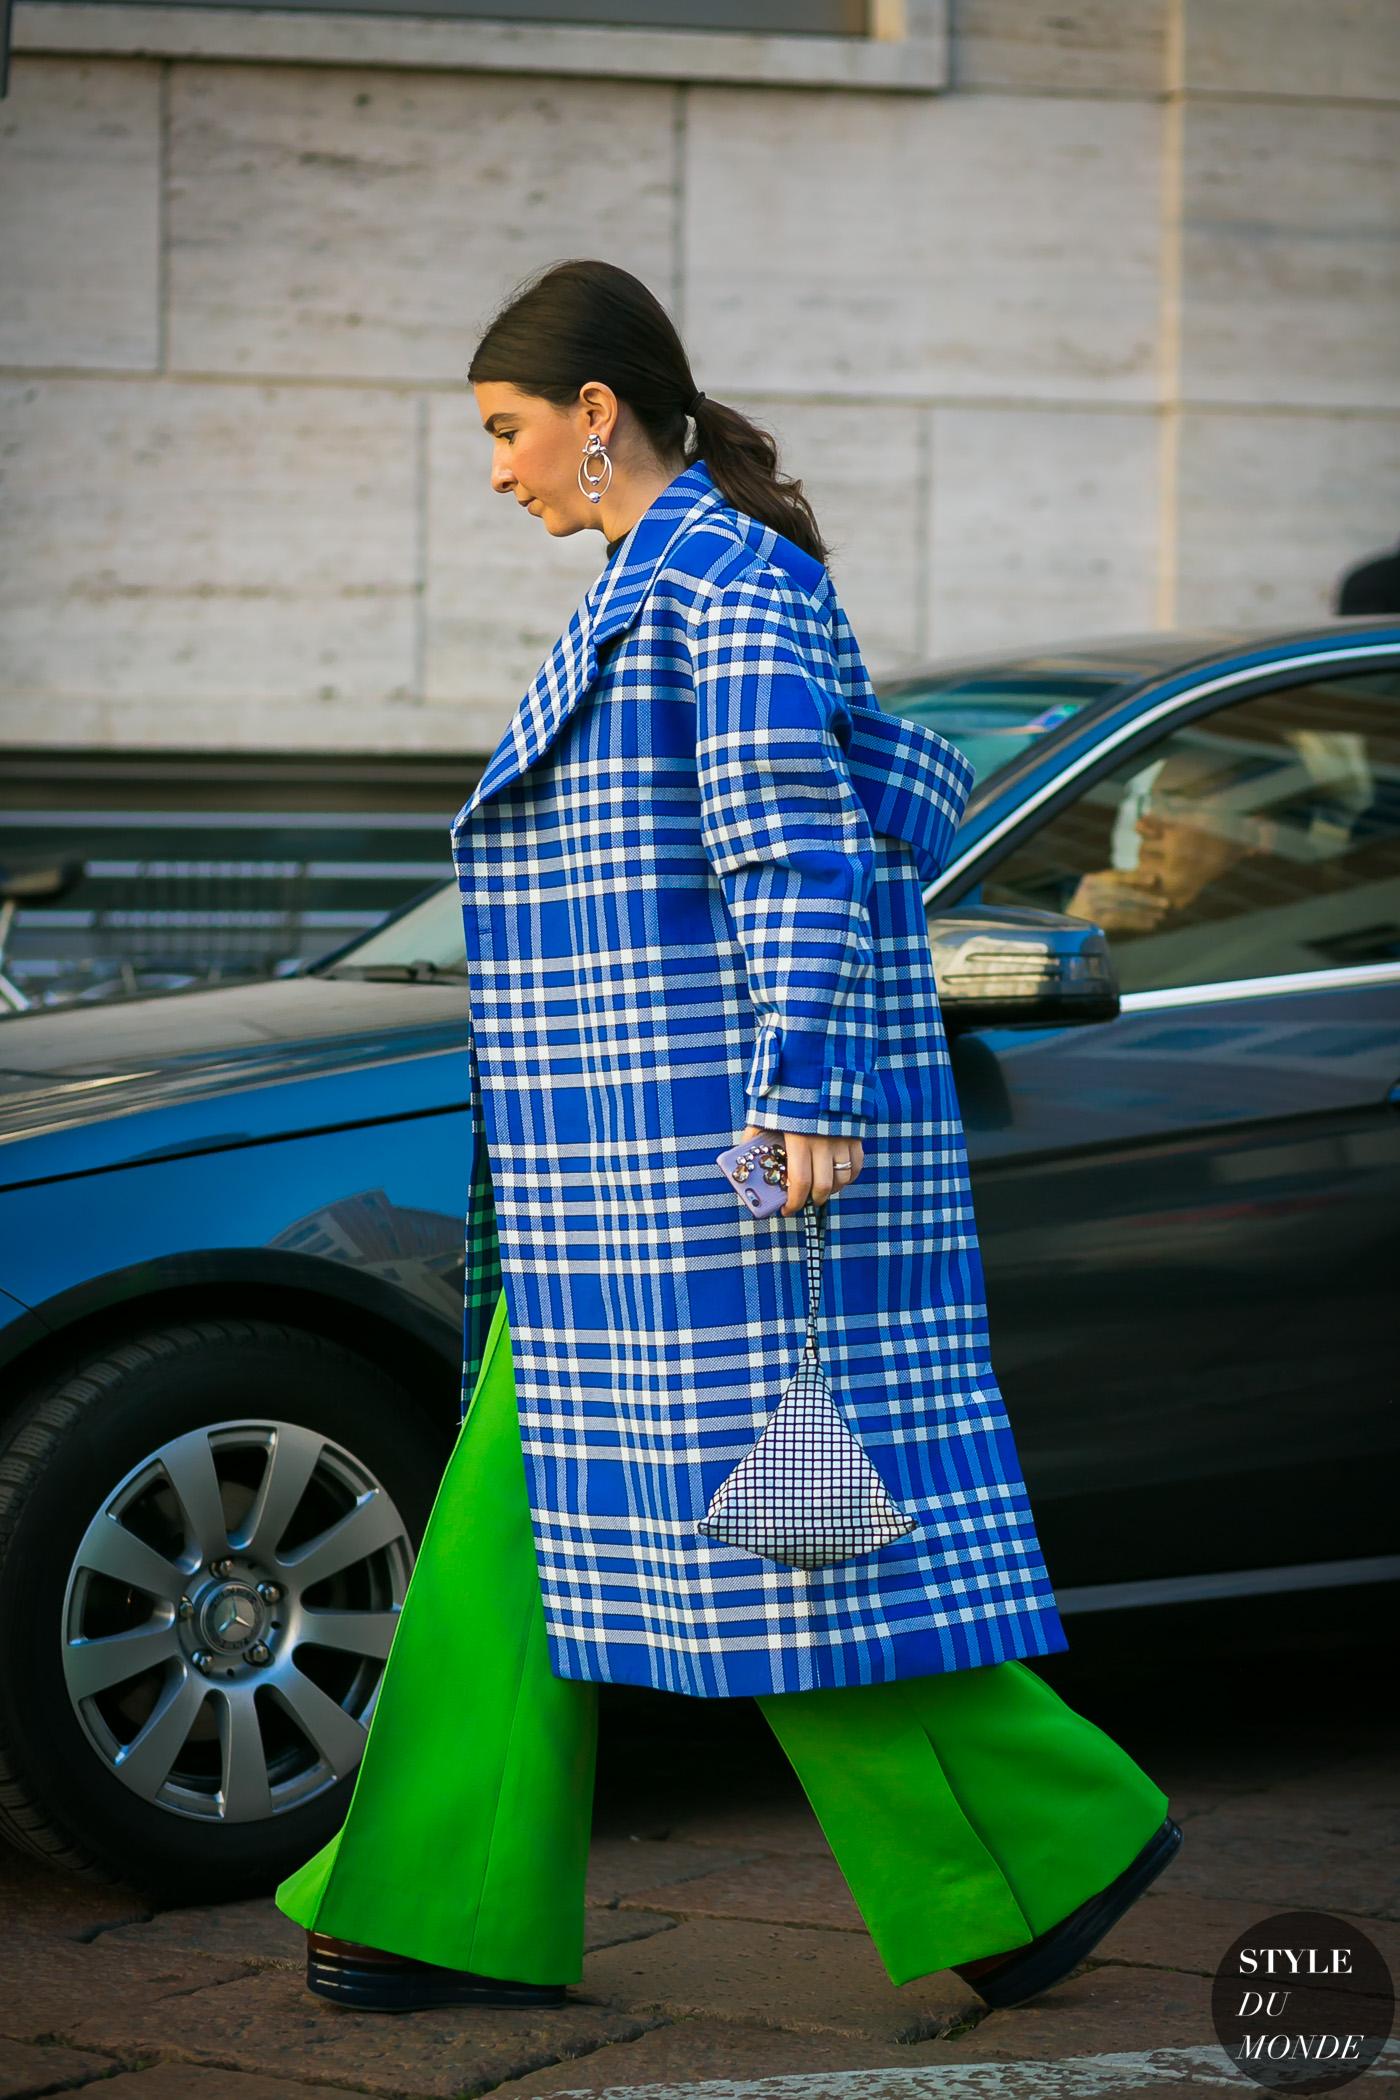 Jacquemus-Plaid-Coat-by-STYLEDUMONDE-Street-Style-Fashion